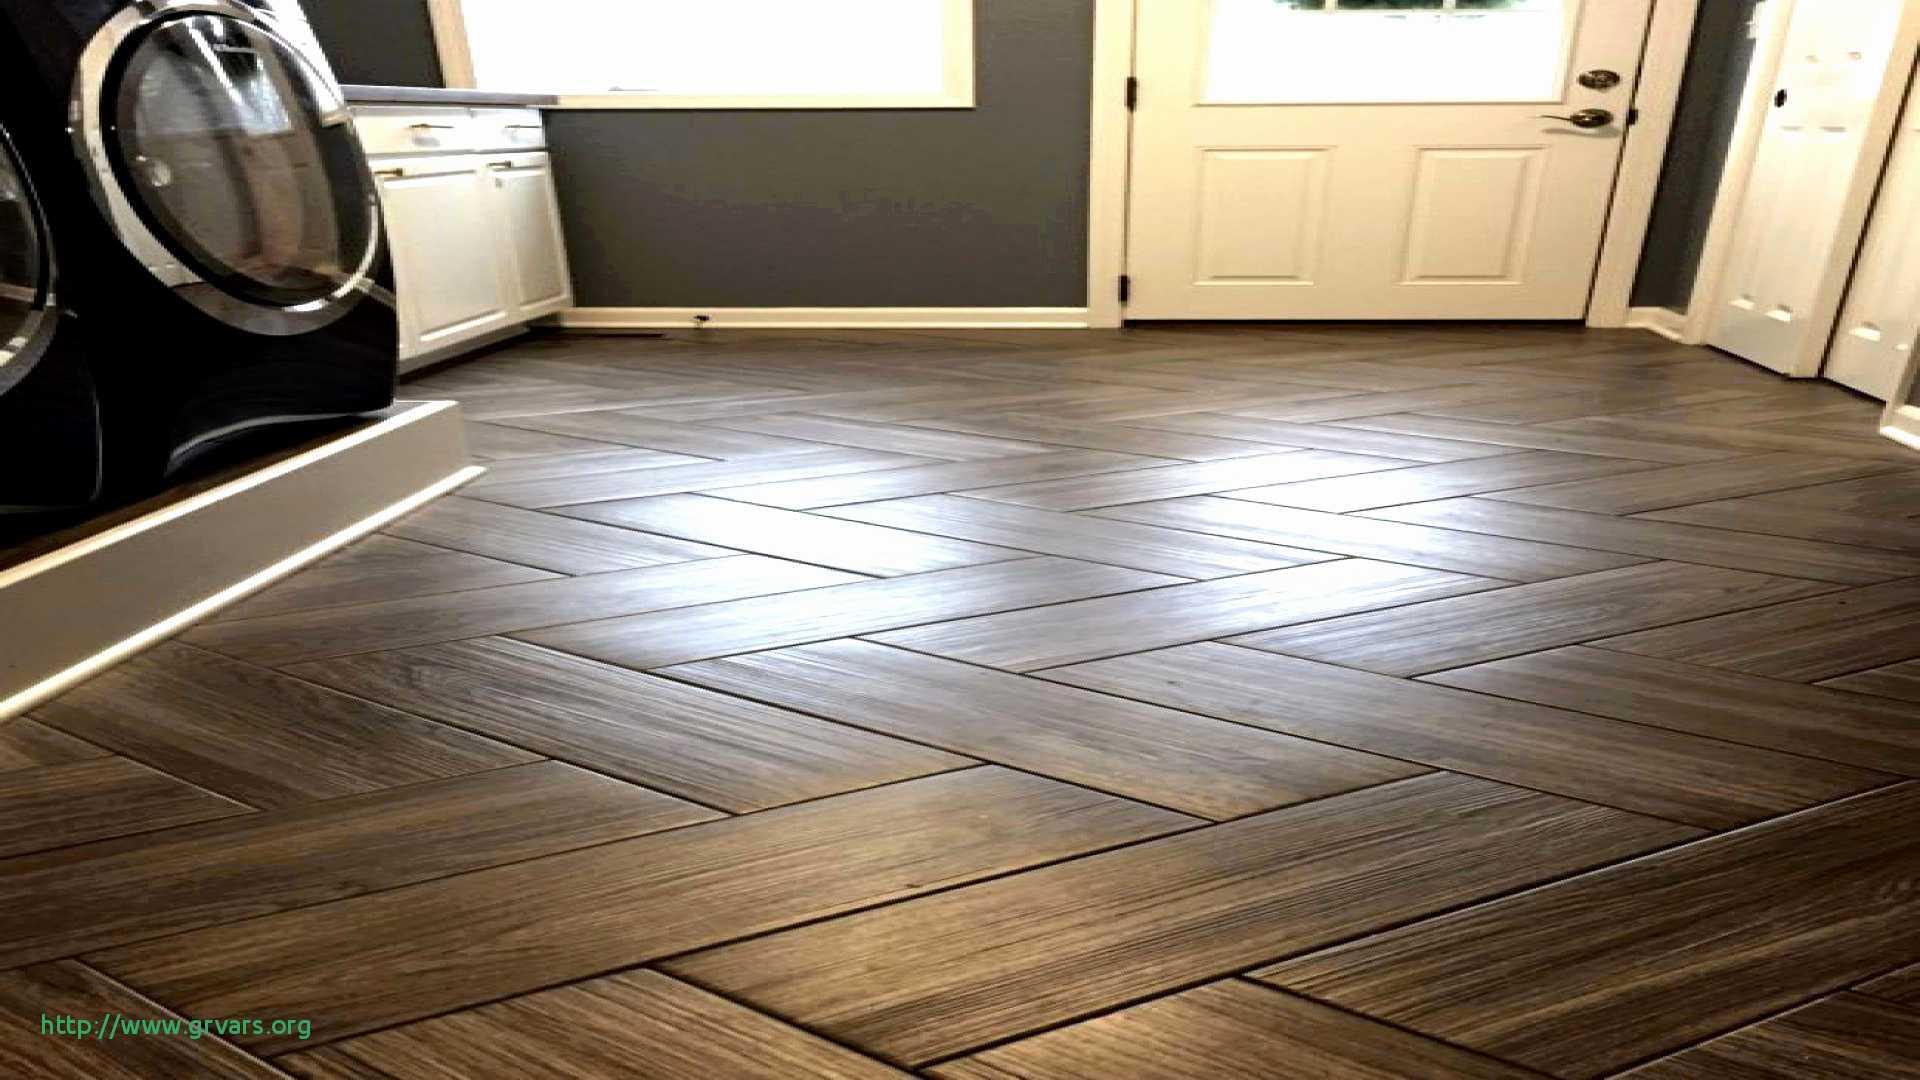 hardwood floor stain options of 15 frais best vacuum for linoleum floors ideas blog for 15 photos of the 15 frais best vacuum for linoleum floors